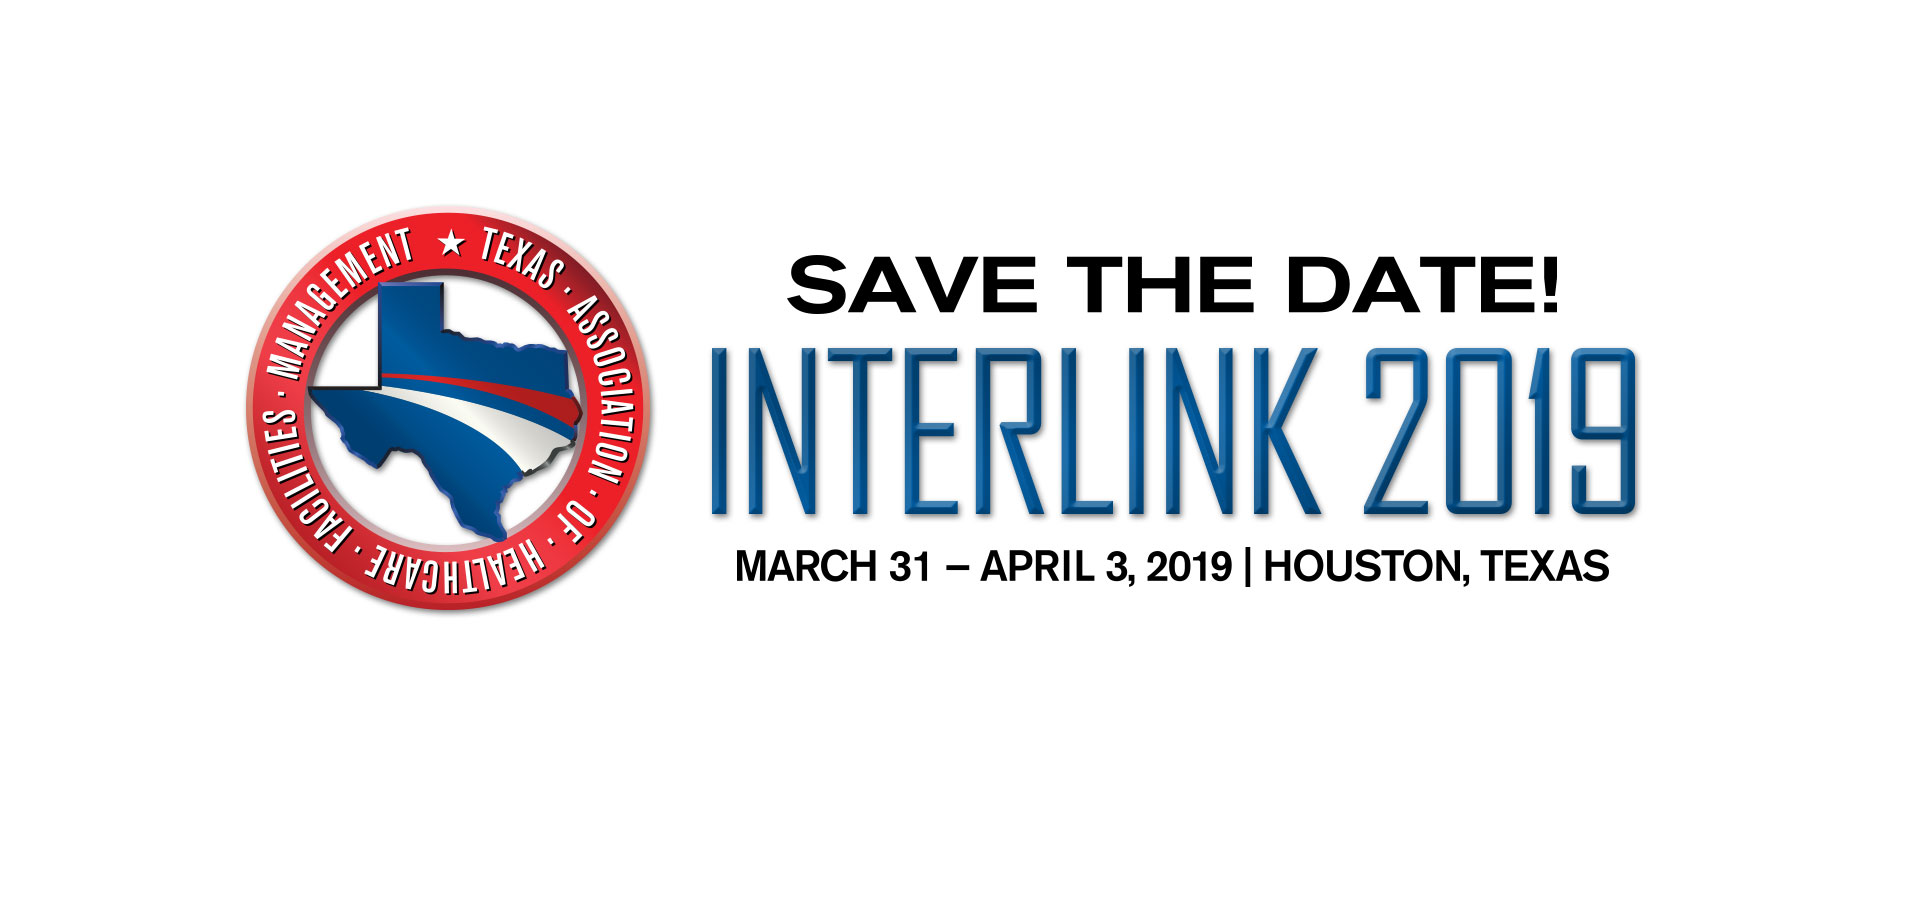 TAHFM Interlink 2019 Save the Date